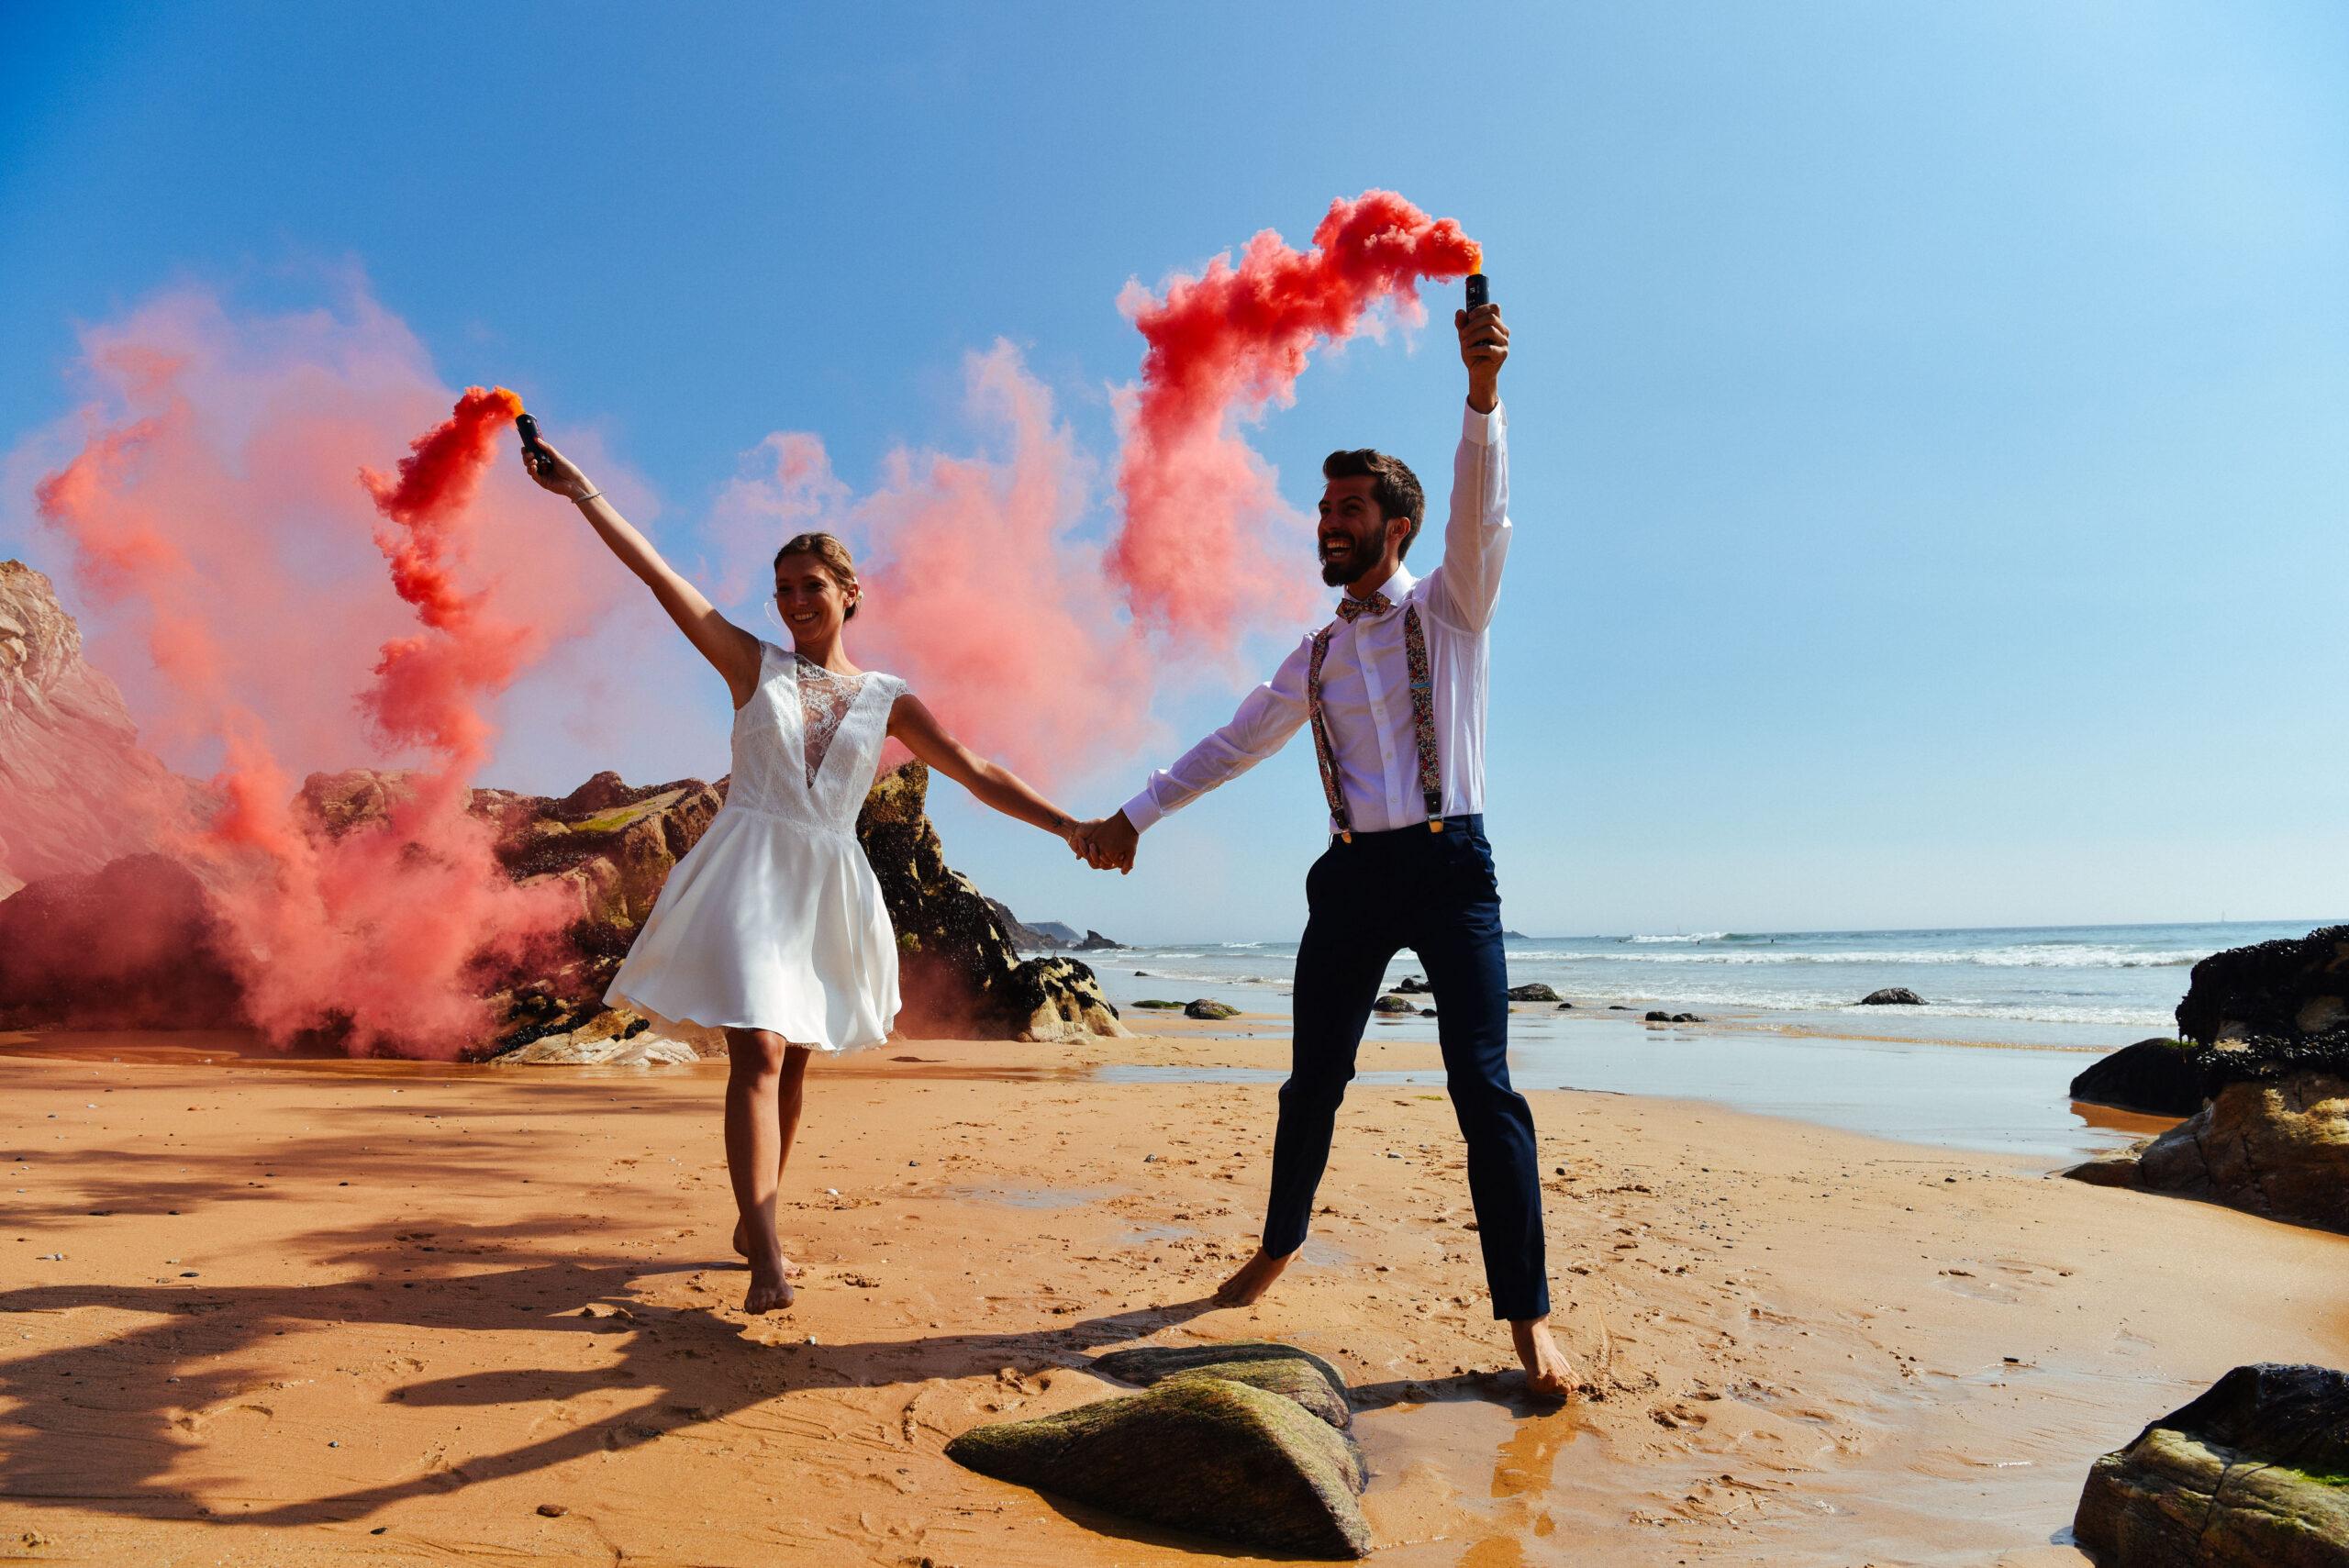 dday wedding planner organisation mariage france mariés bord de mer